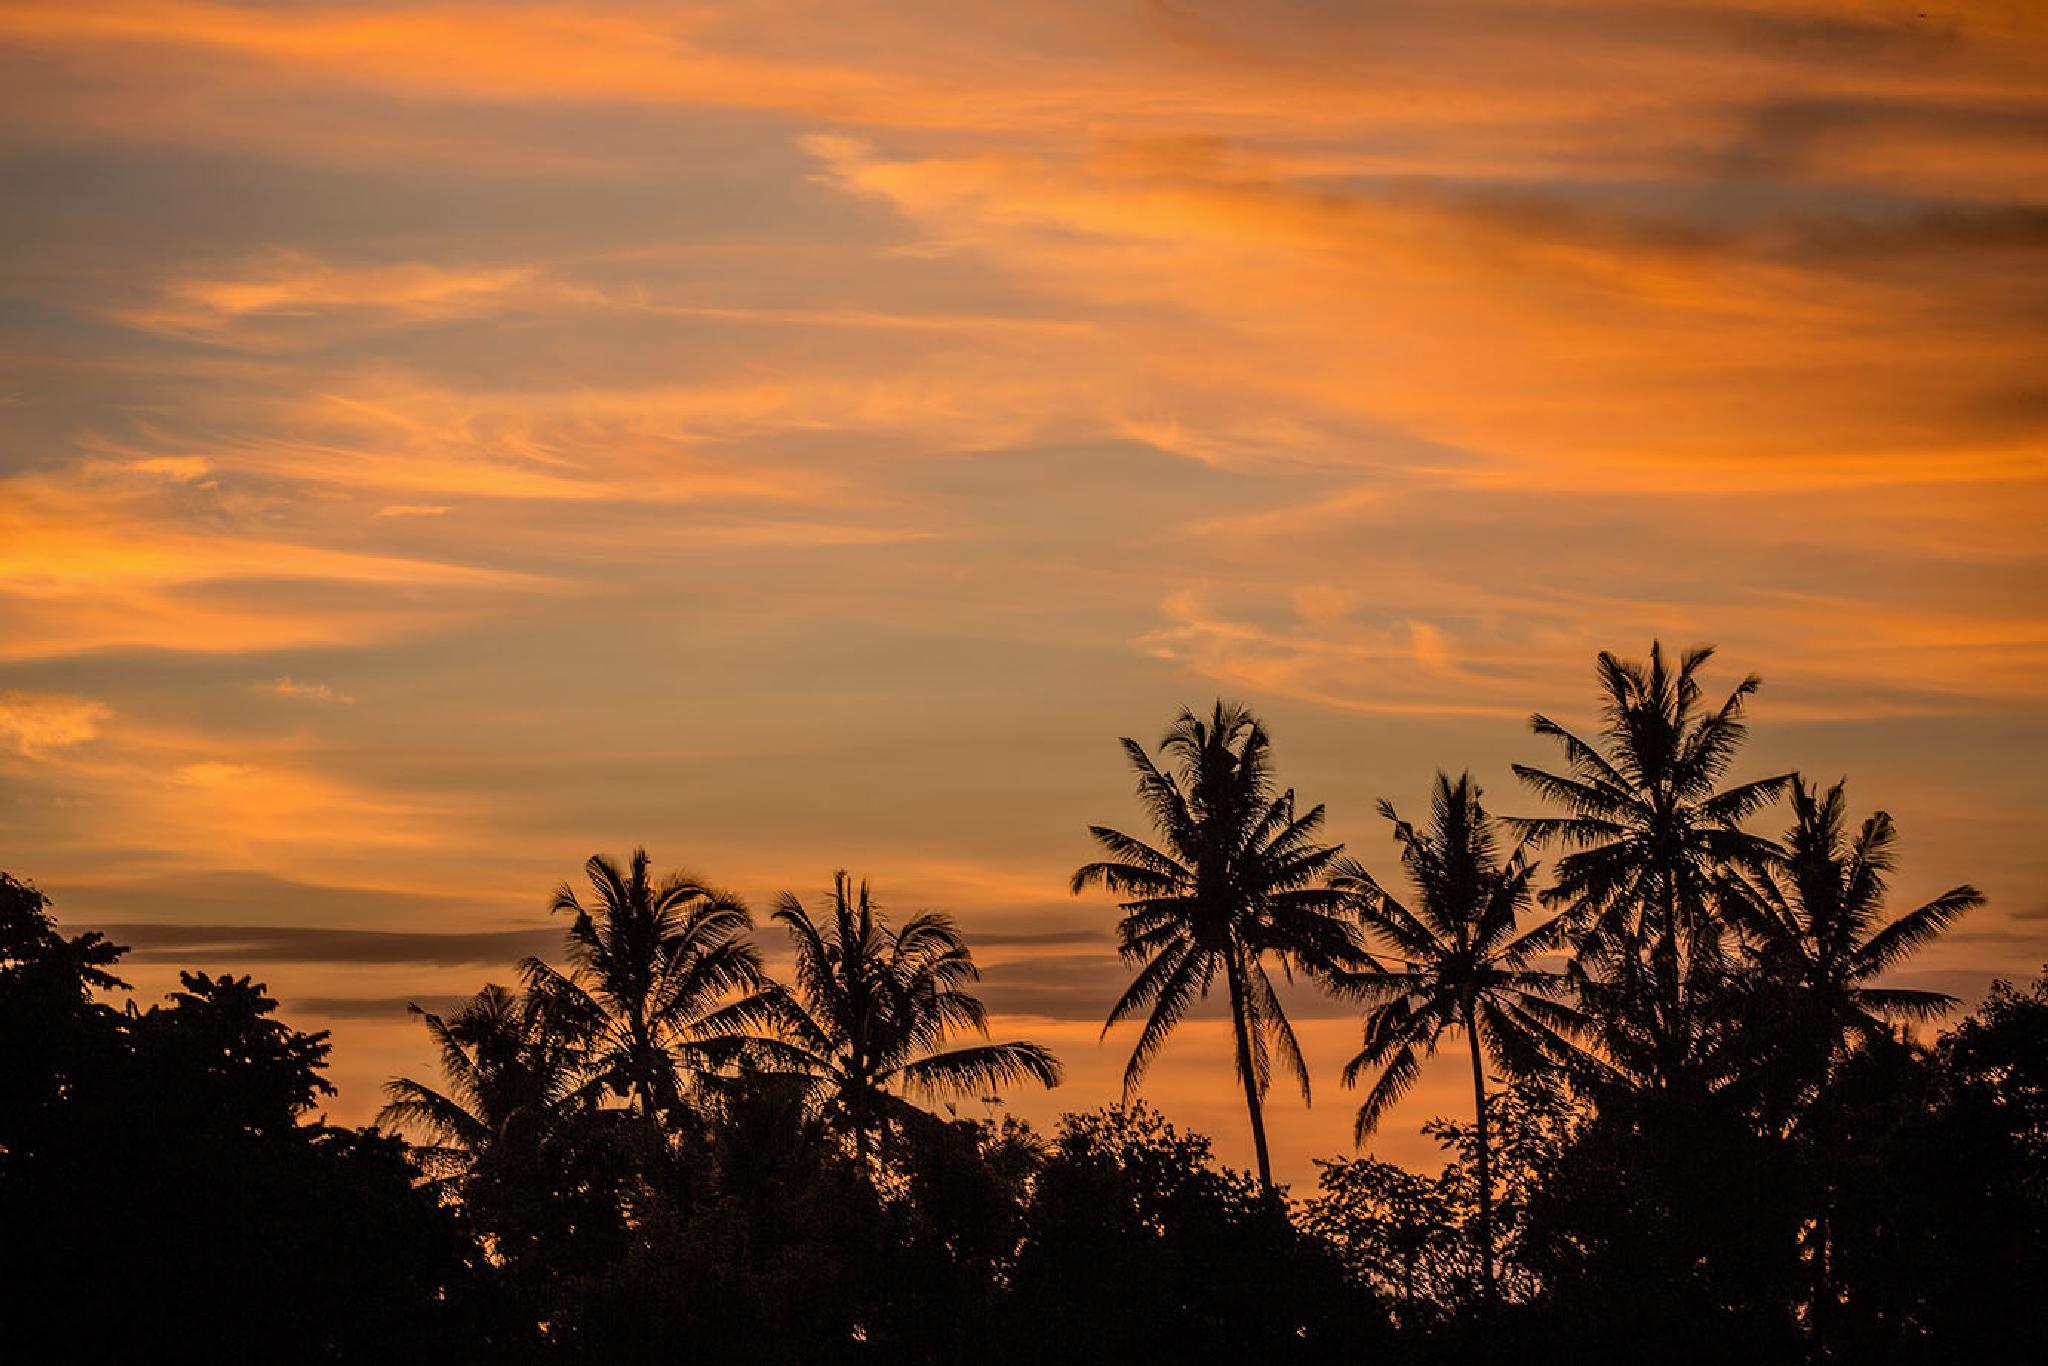 Sunset in Bali creating an orange sky by harshsekhsaria